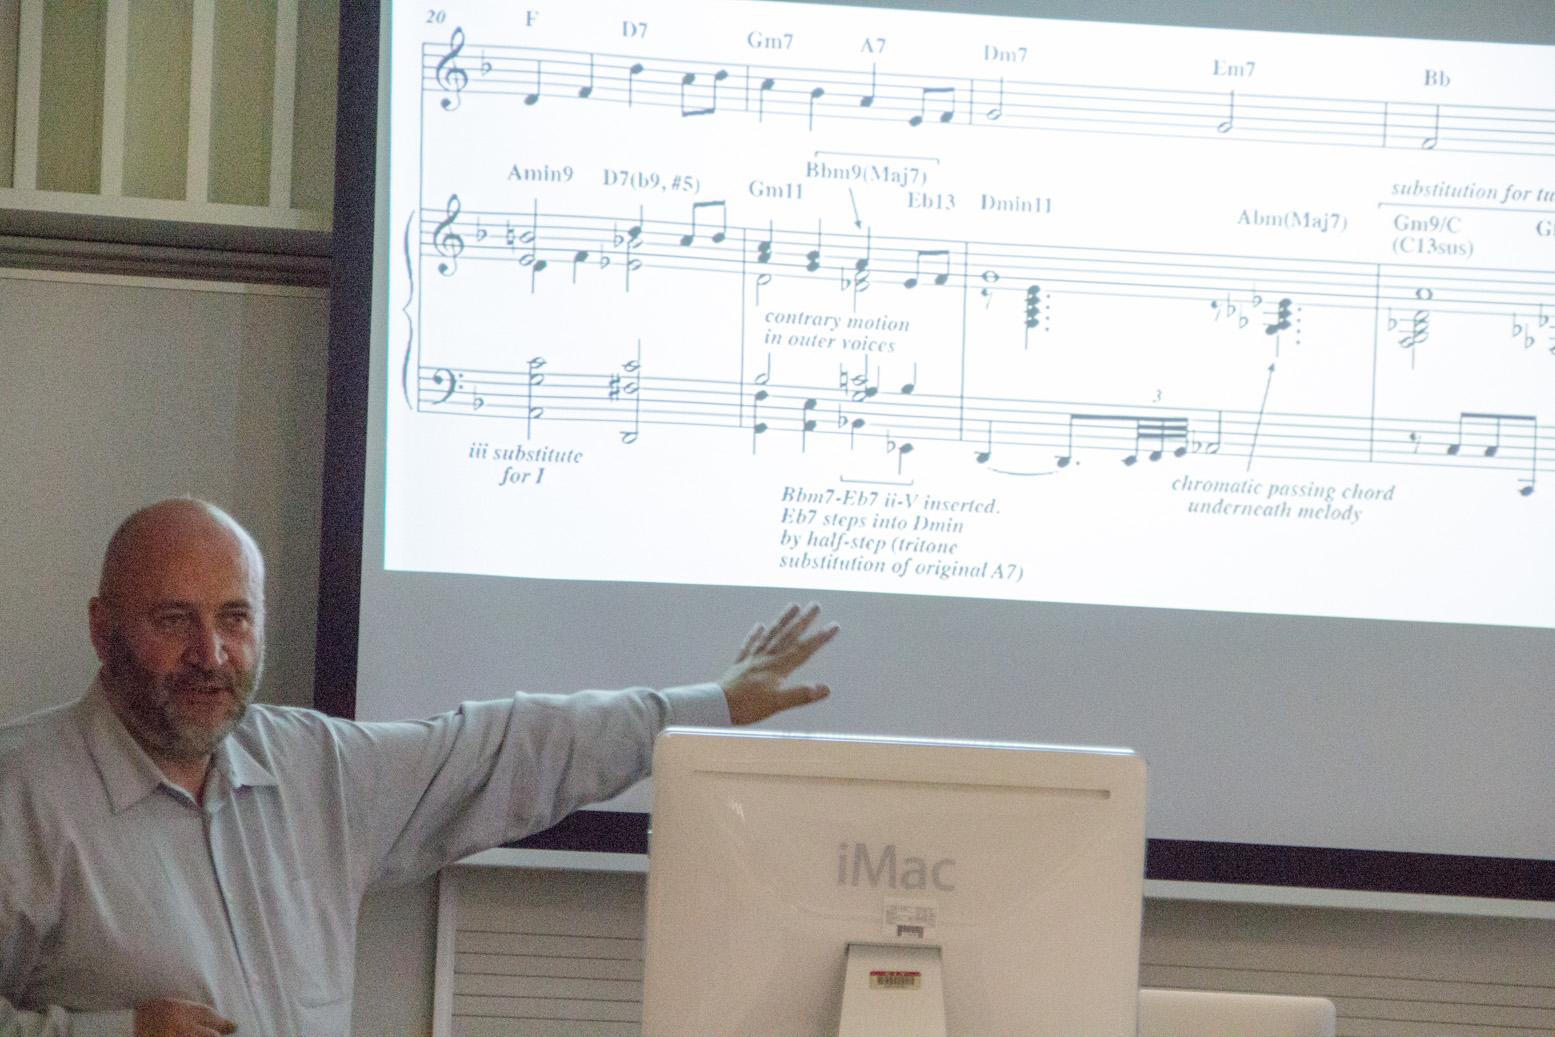 David o'rourke in jazz arranging workshop at cork jazz festival